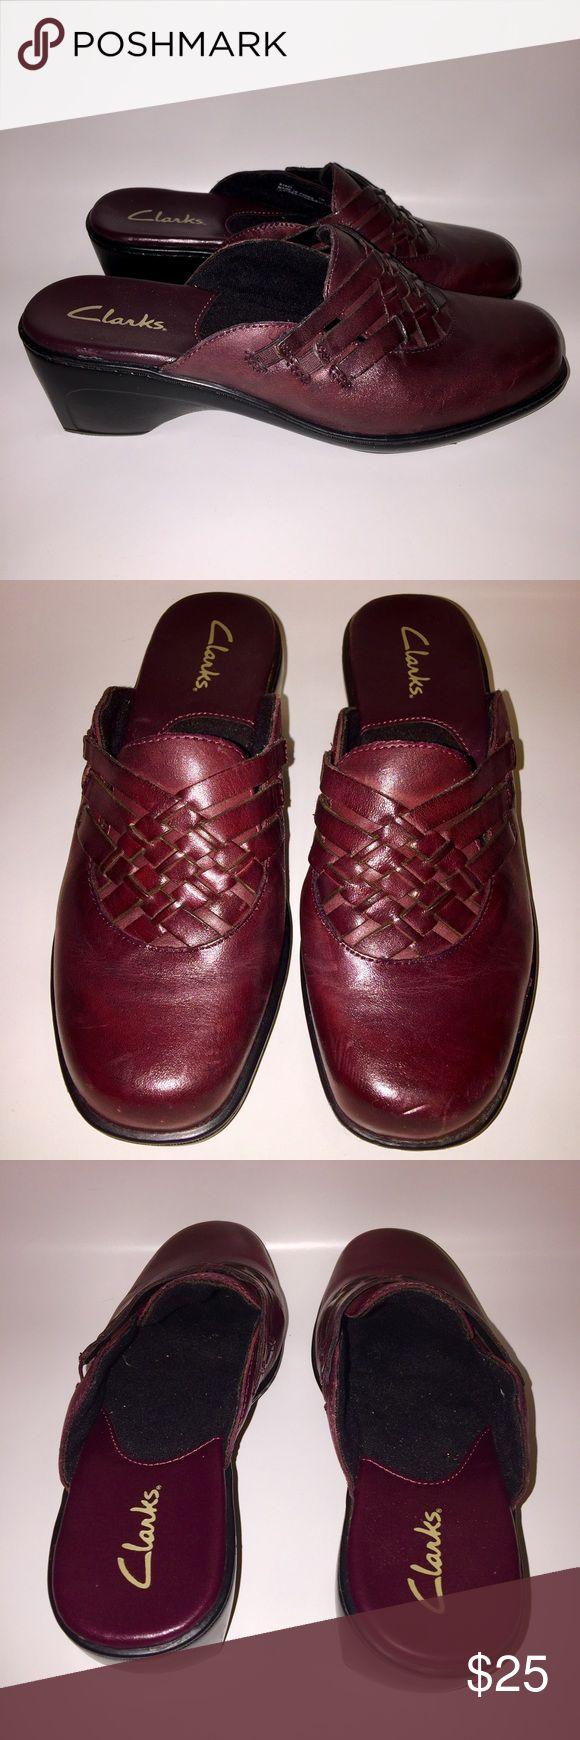 CLARKS WOMENS 7W SLIP ON MULE CLOG CLARKS WOMENS SLIP ON MULE CLOG 7W Clarks Shoes Mules & Clogs